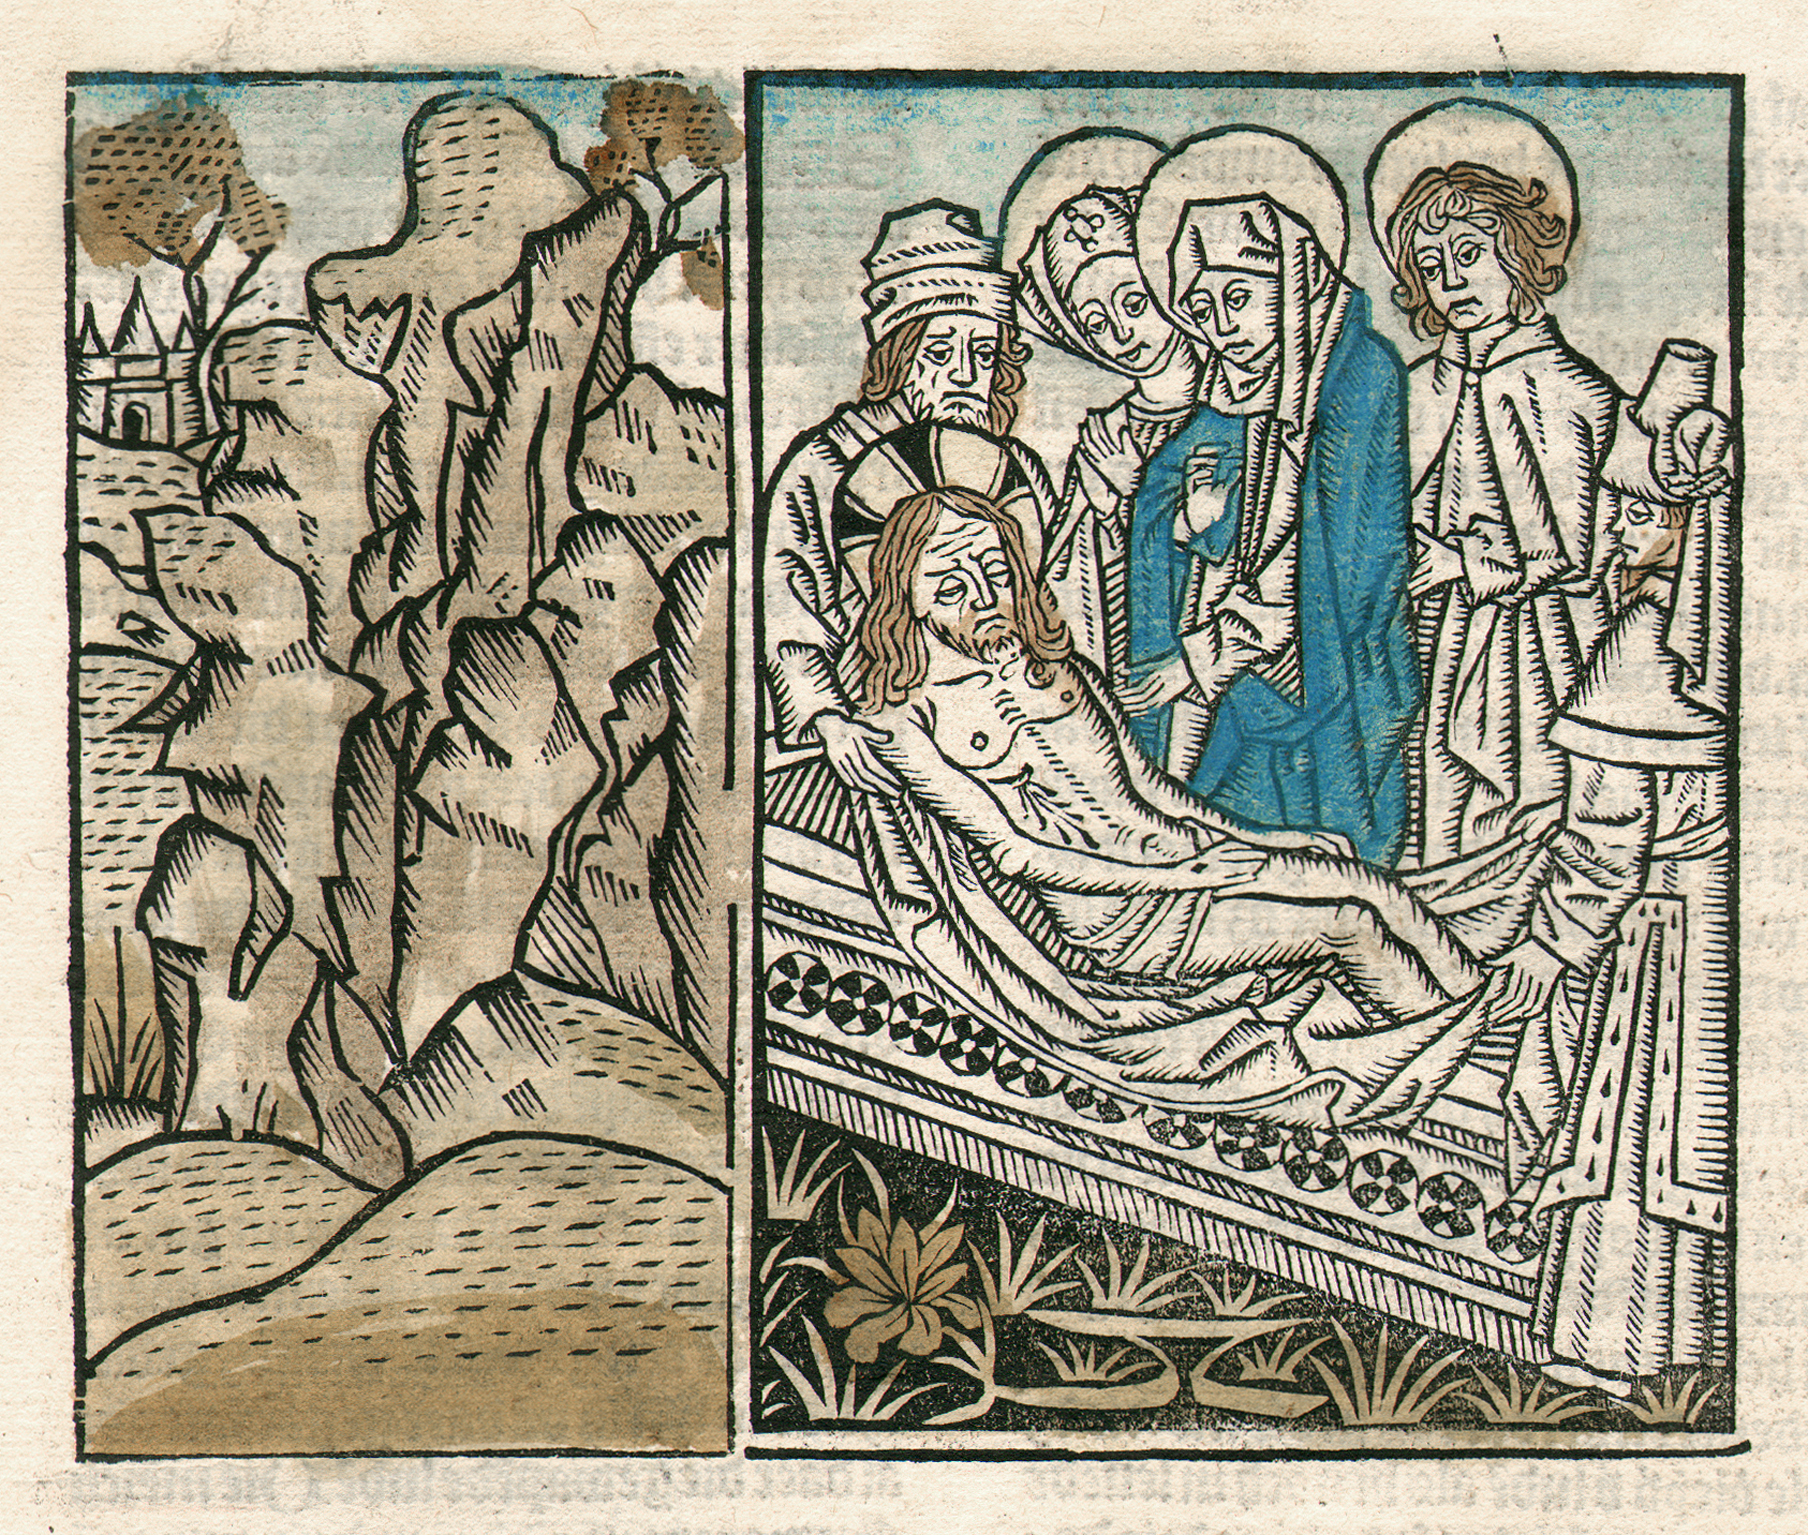 File:1487 Haarlem Woodcutter De Vita Christi.jpeg